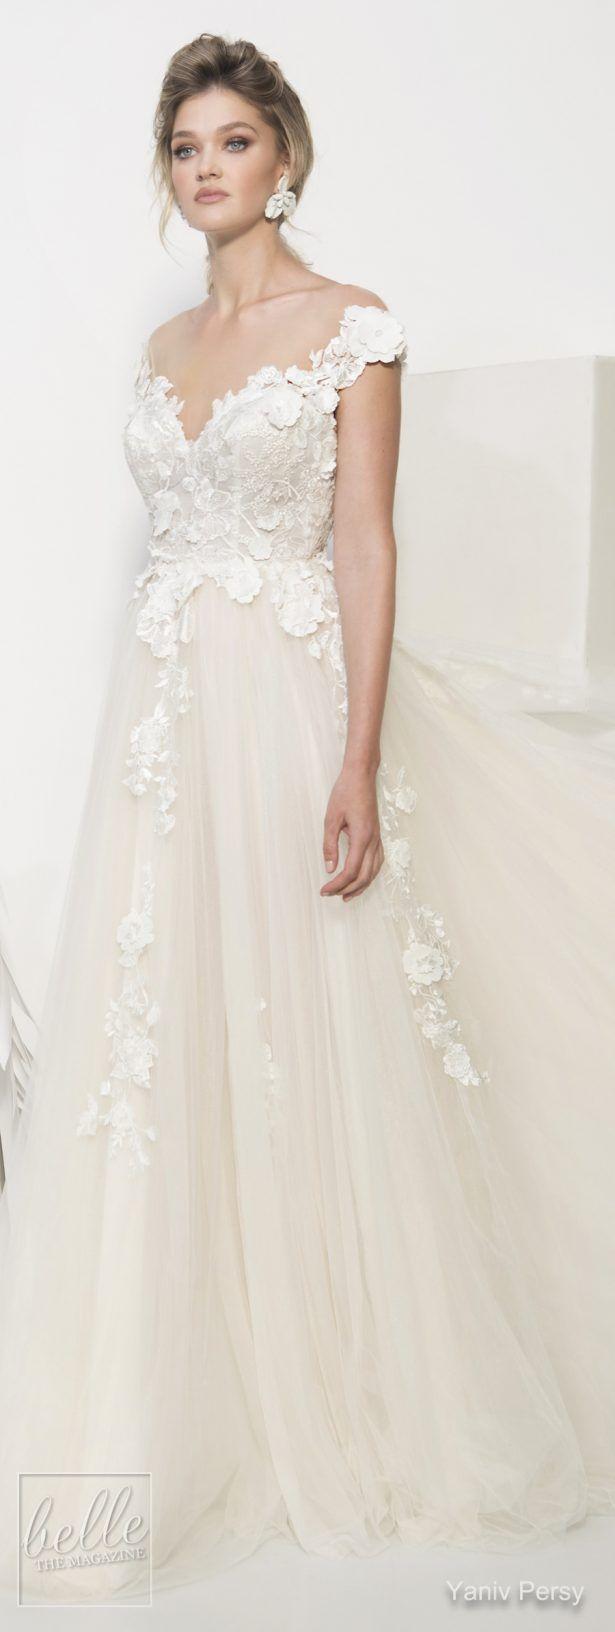 yaniv persy wedding dresses spring 2019 bridal collection